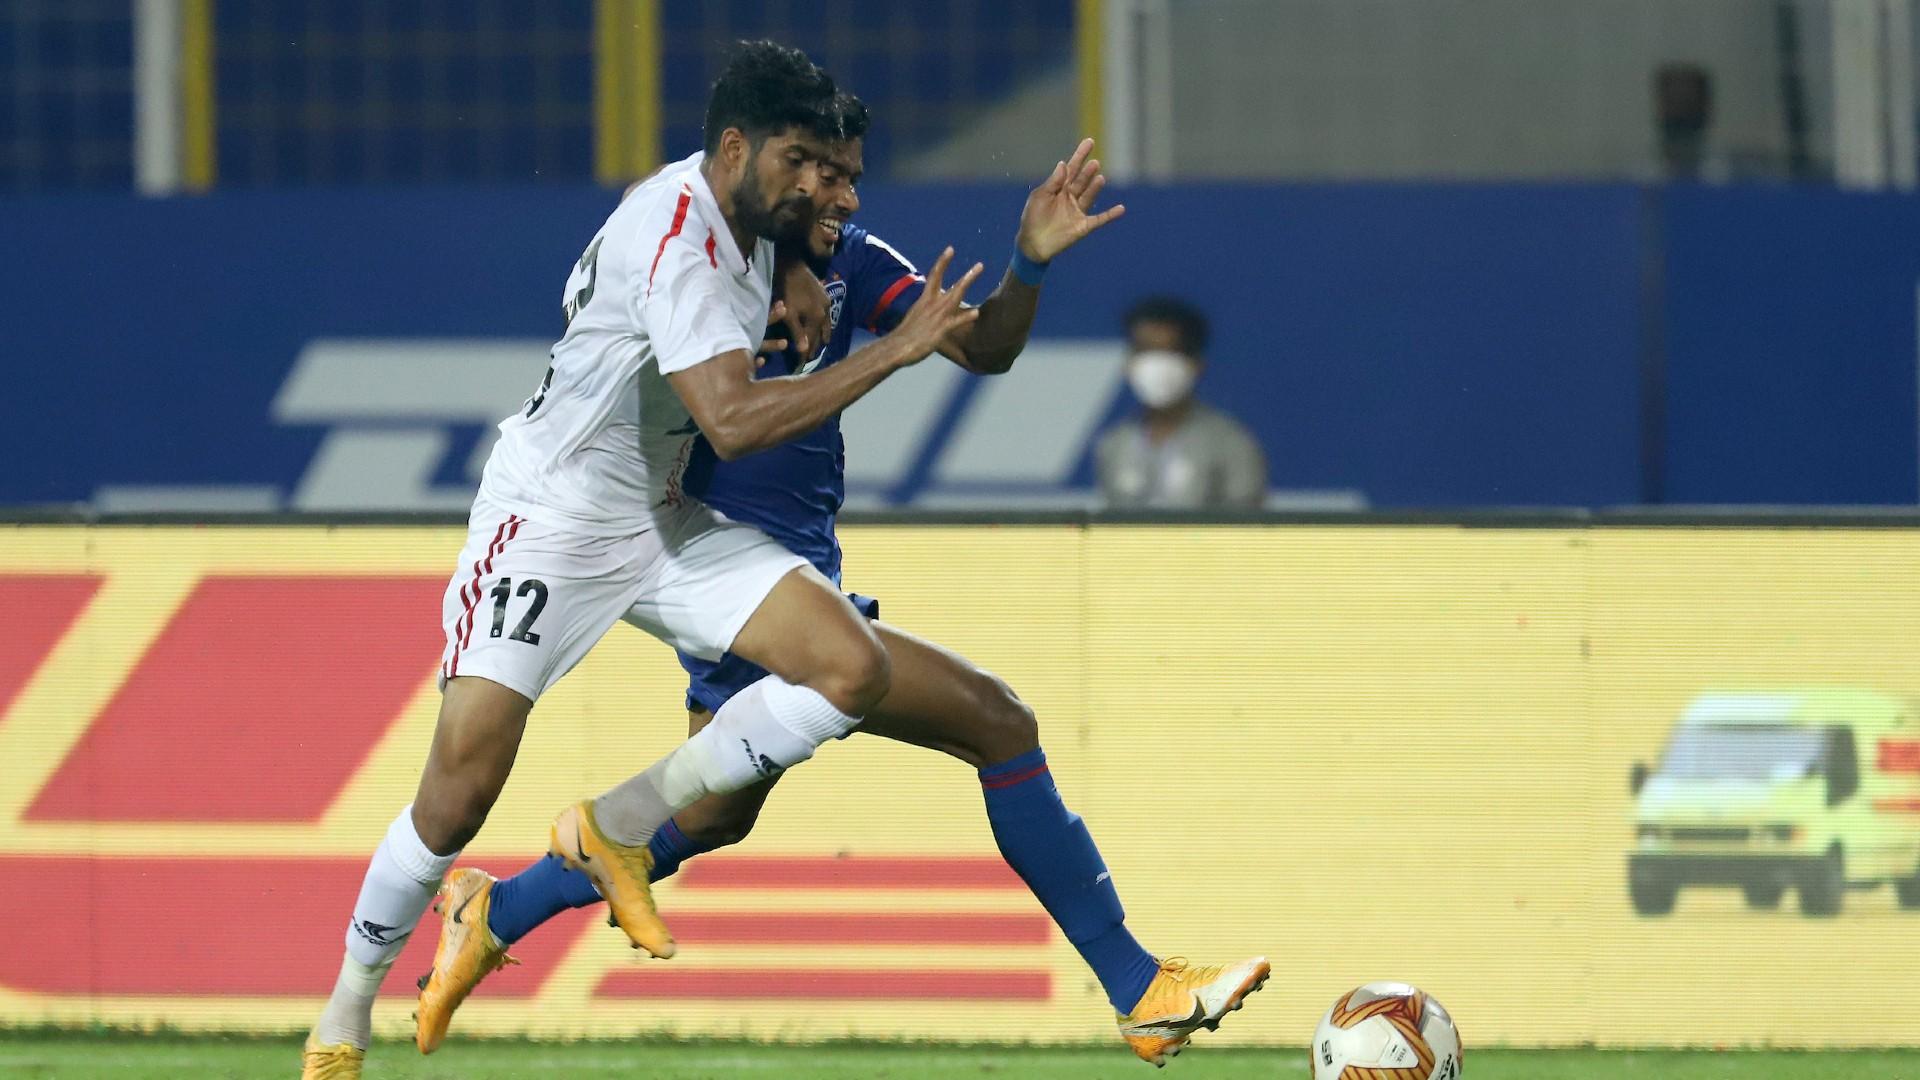 ISL: Ashutosh Mehta set to join ATK Mohun Bagan on a three-year deal   Goal.com